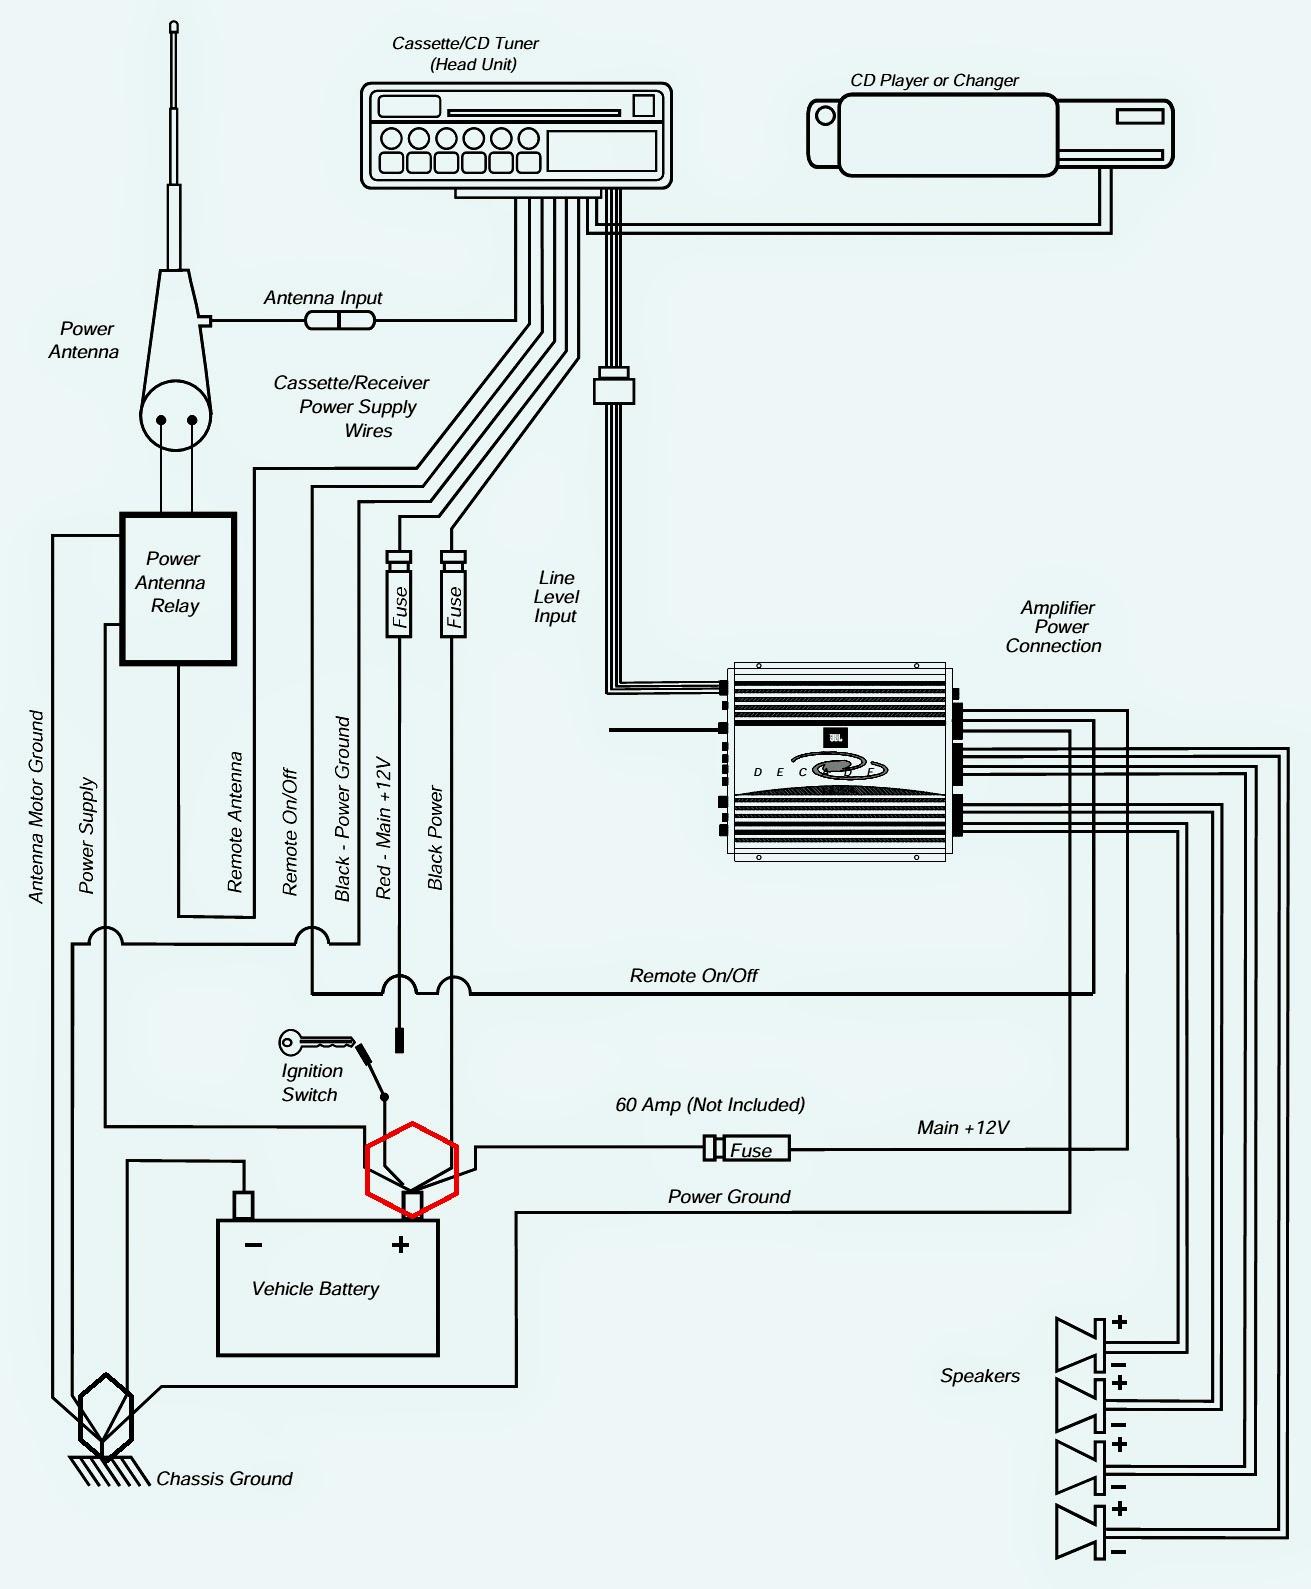 LH_2711] Sub Amp Wiring Diagram Head Unit Sub Circuit Diagrams Free DiagramArcin Bupi Dylit Exmet Mohammedshrine Librar Wiring 101